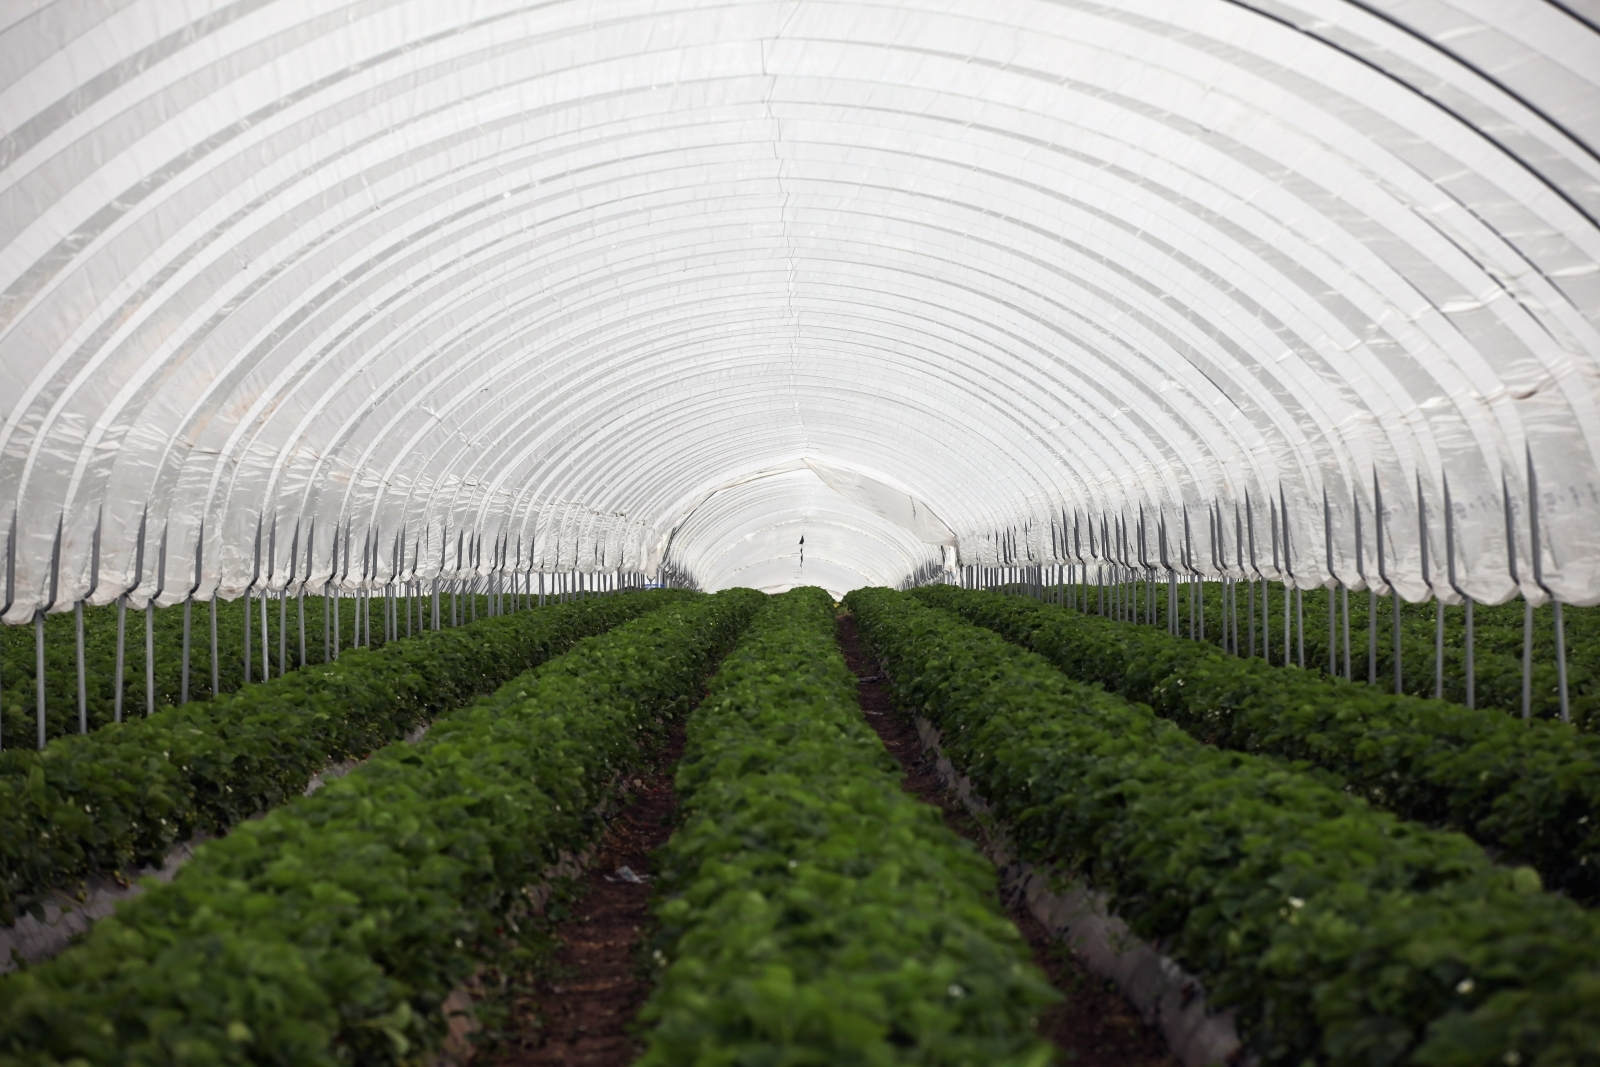 Strawberry farm in Shropshire, UK